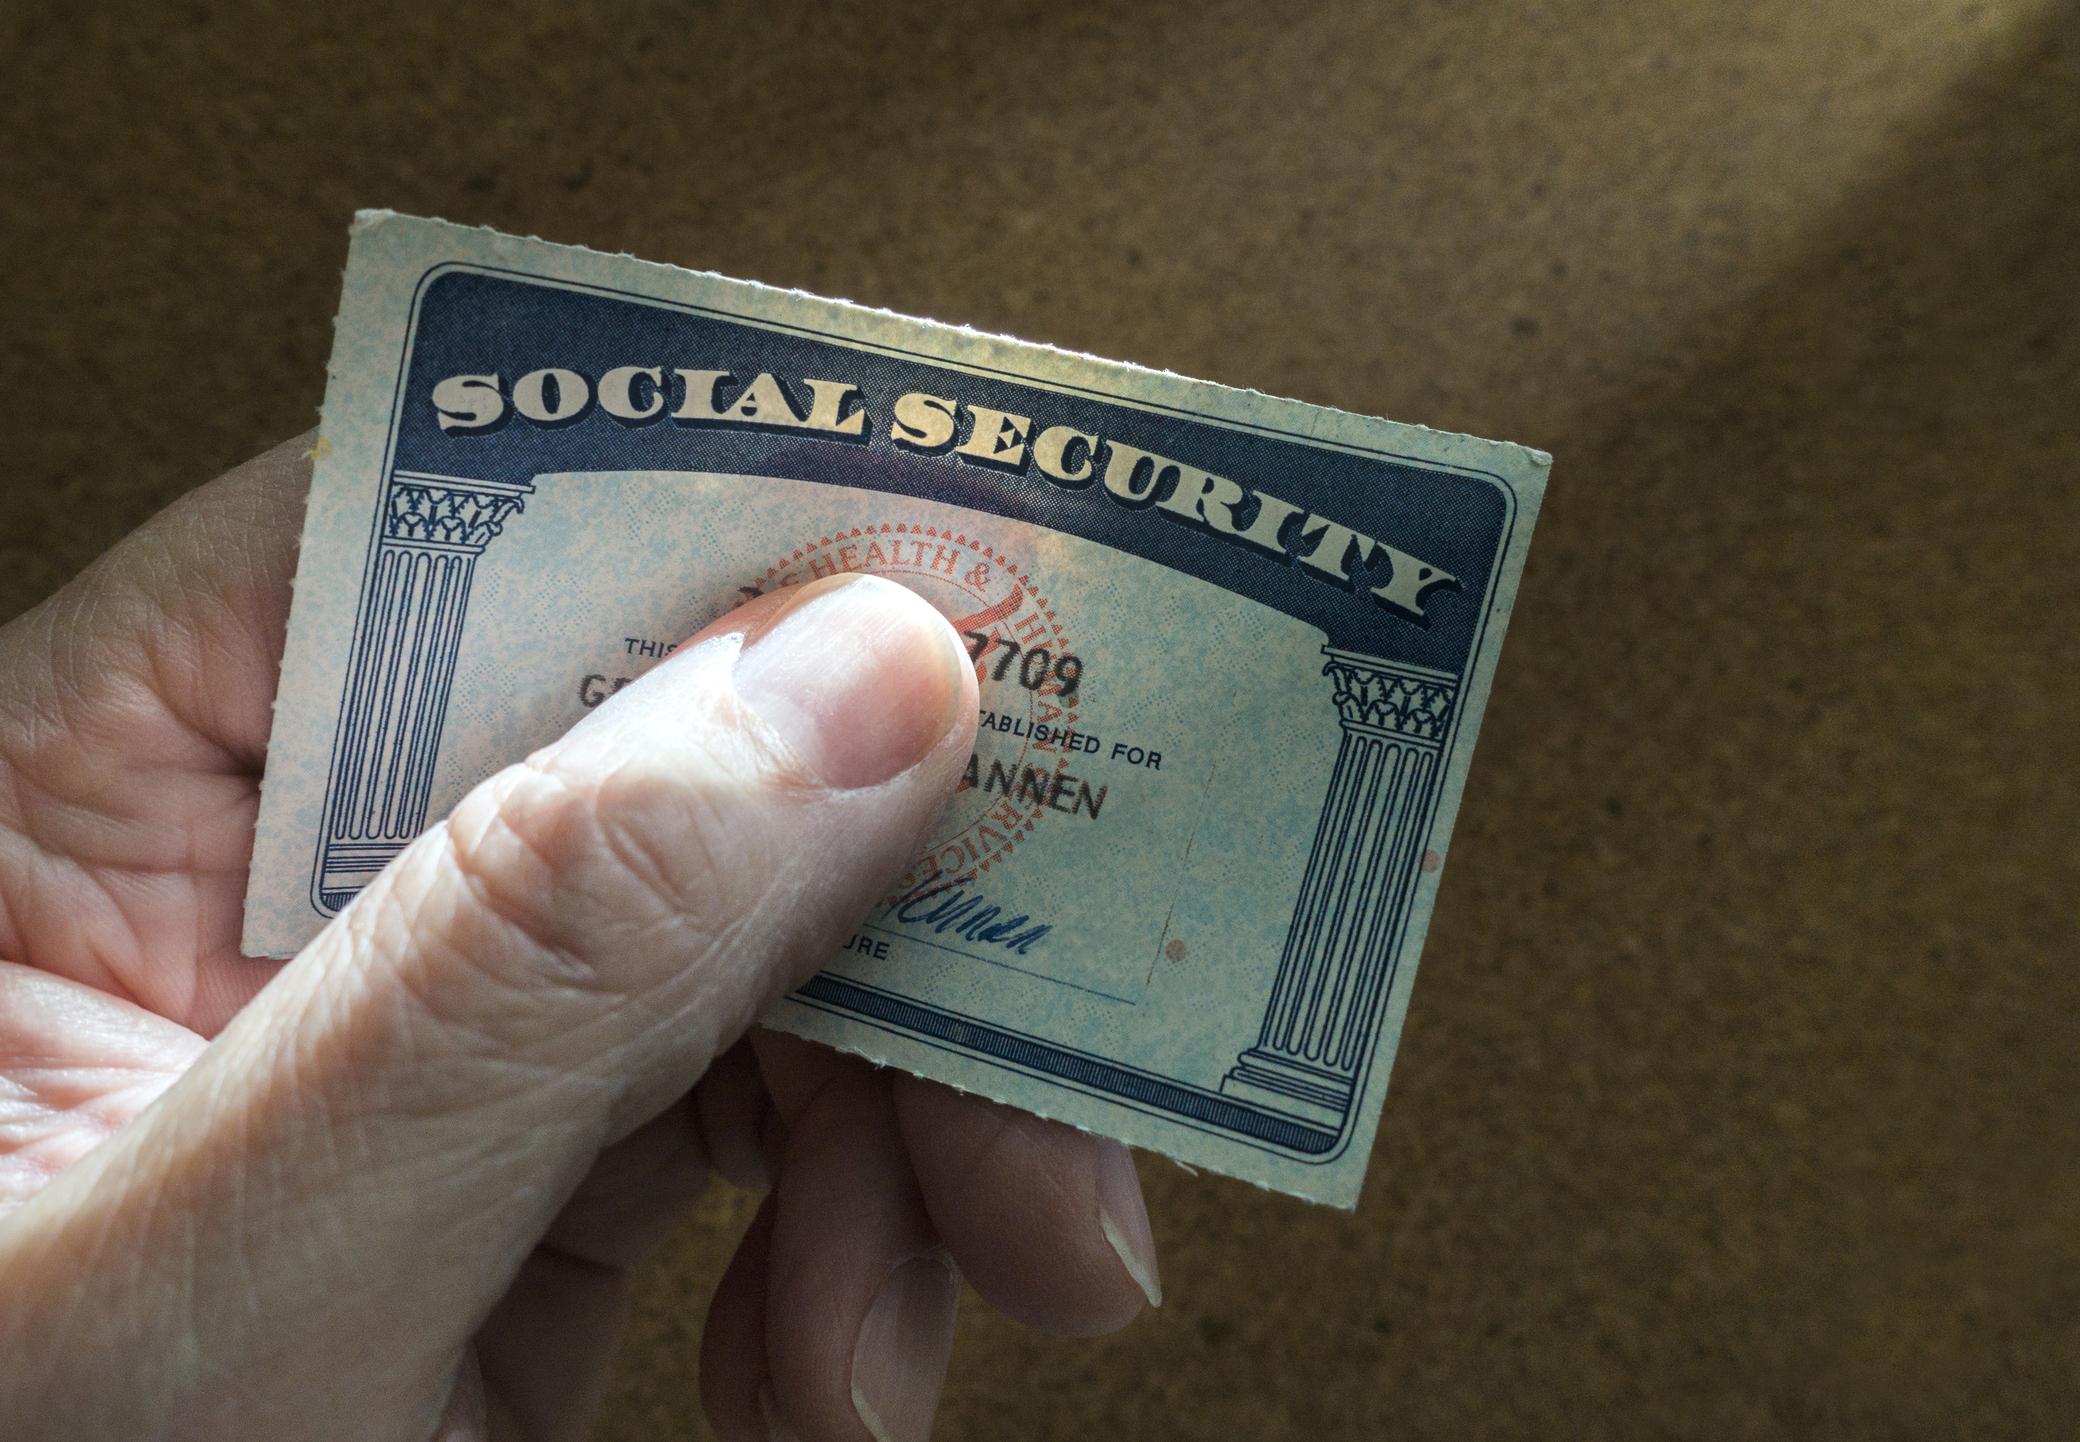 A senior's hand tightly holding a Social Security card.